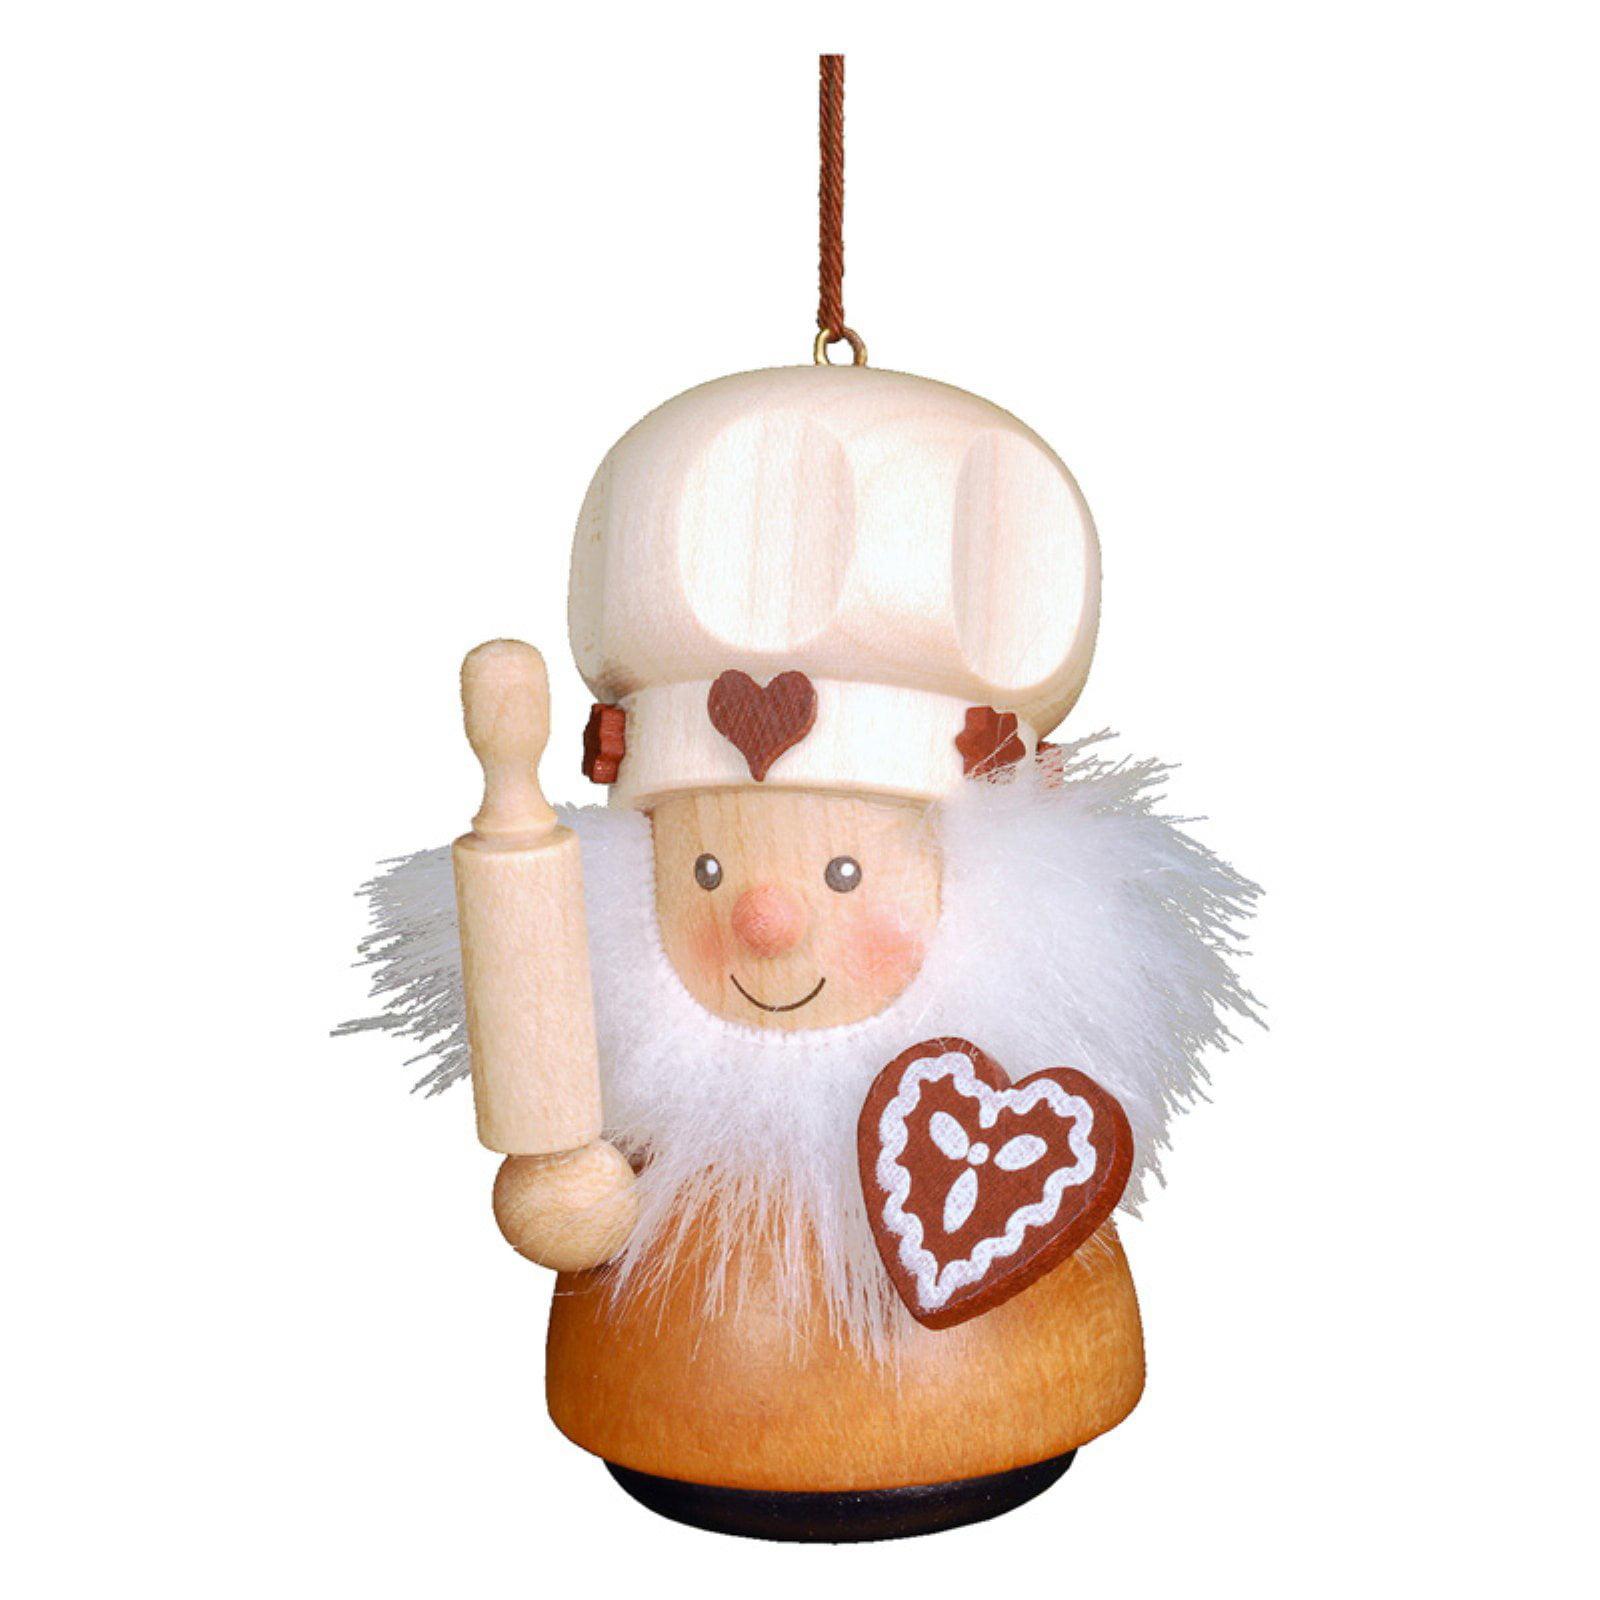 Christian Ulbricht 3 in. Gingerbread Baker Ornament